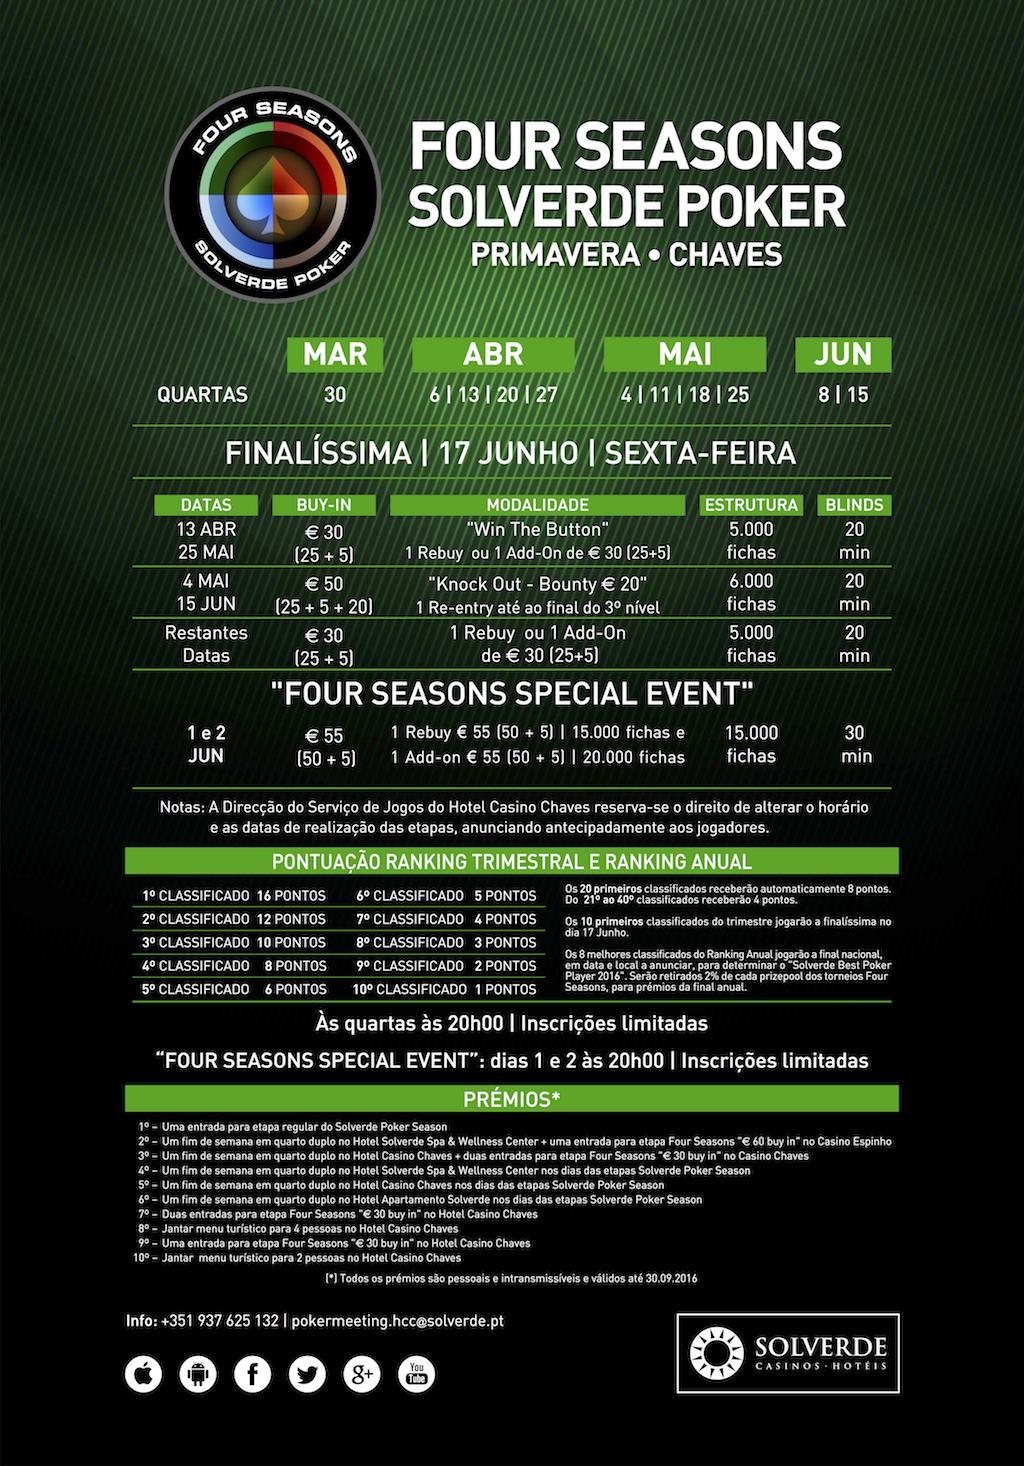 Etapa #2 Four Seasons Solverde Poker Primavera - 6 de  Abril no Hotel Casino Chaves 101